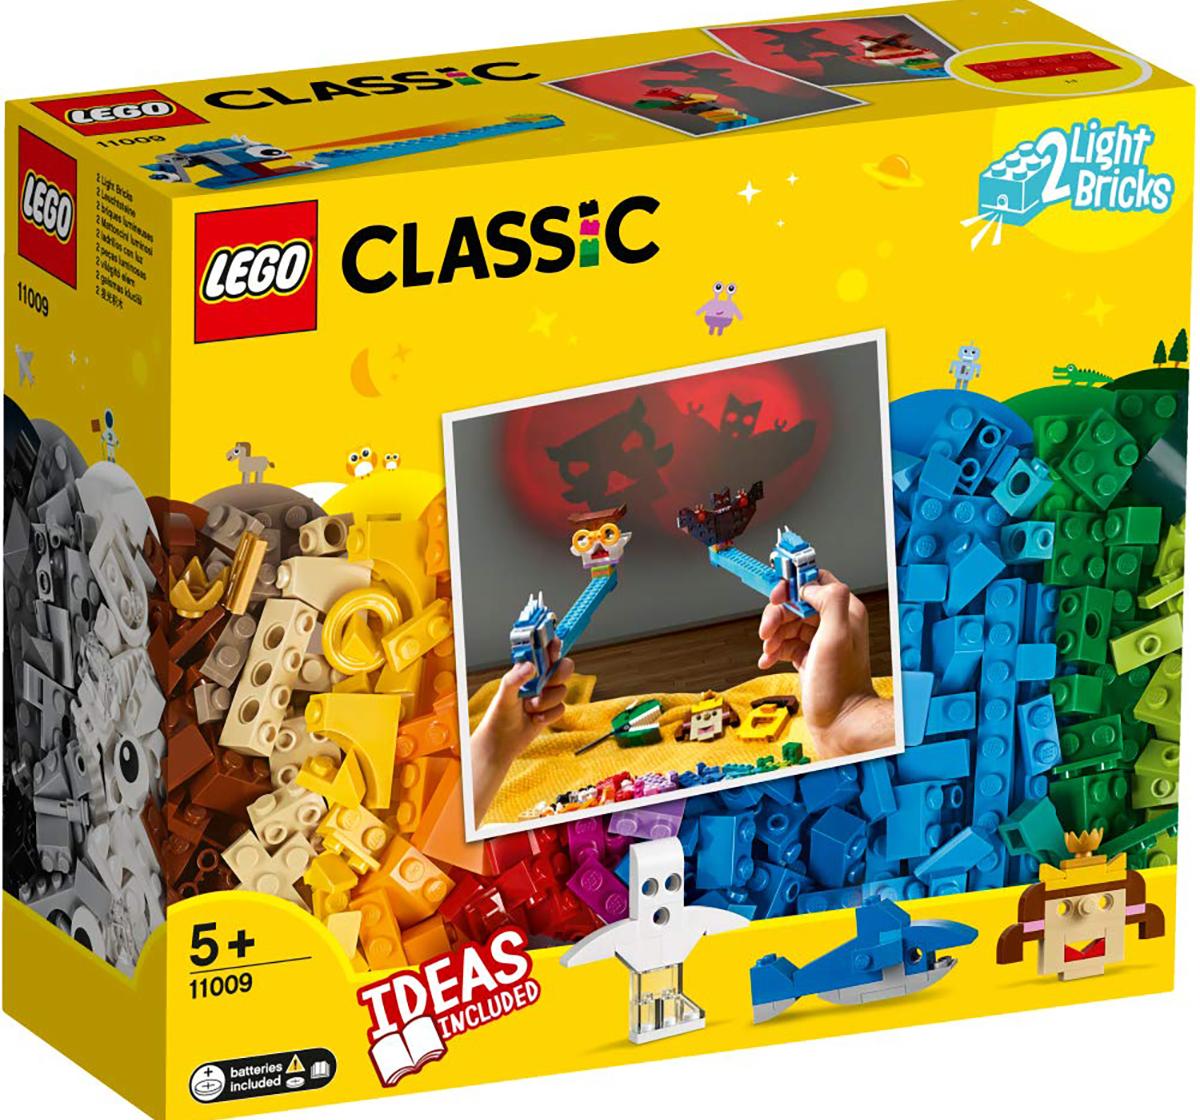 LEGO   Lego 11009 Bricks And Lights Blocks for Kids age 5Y+